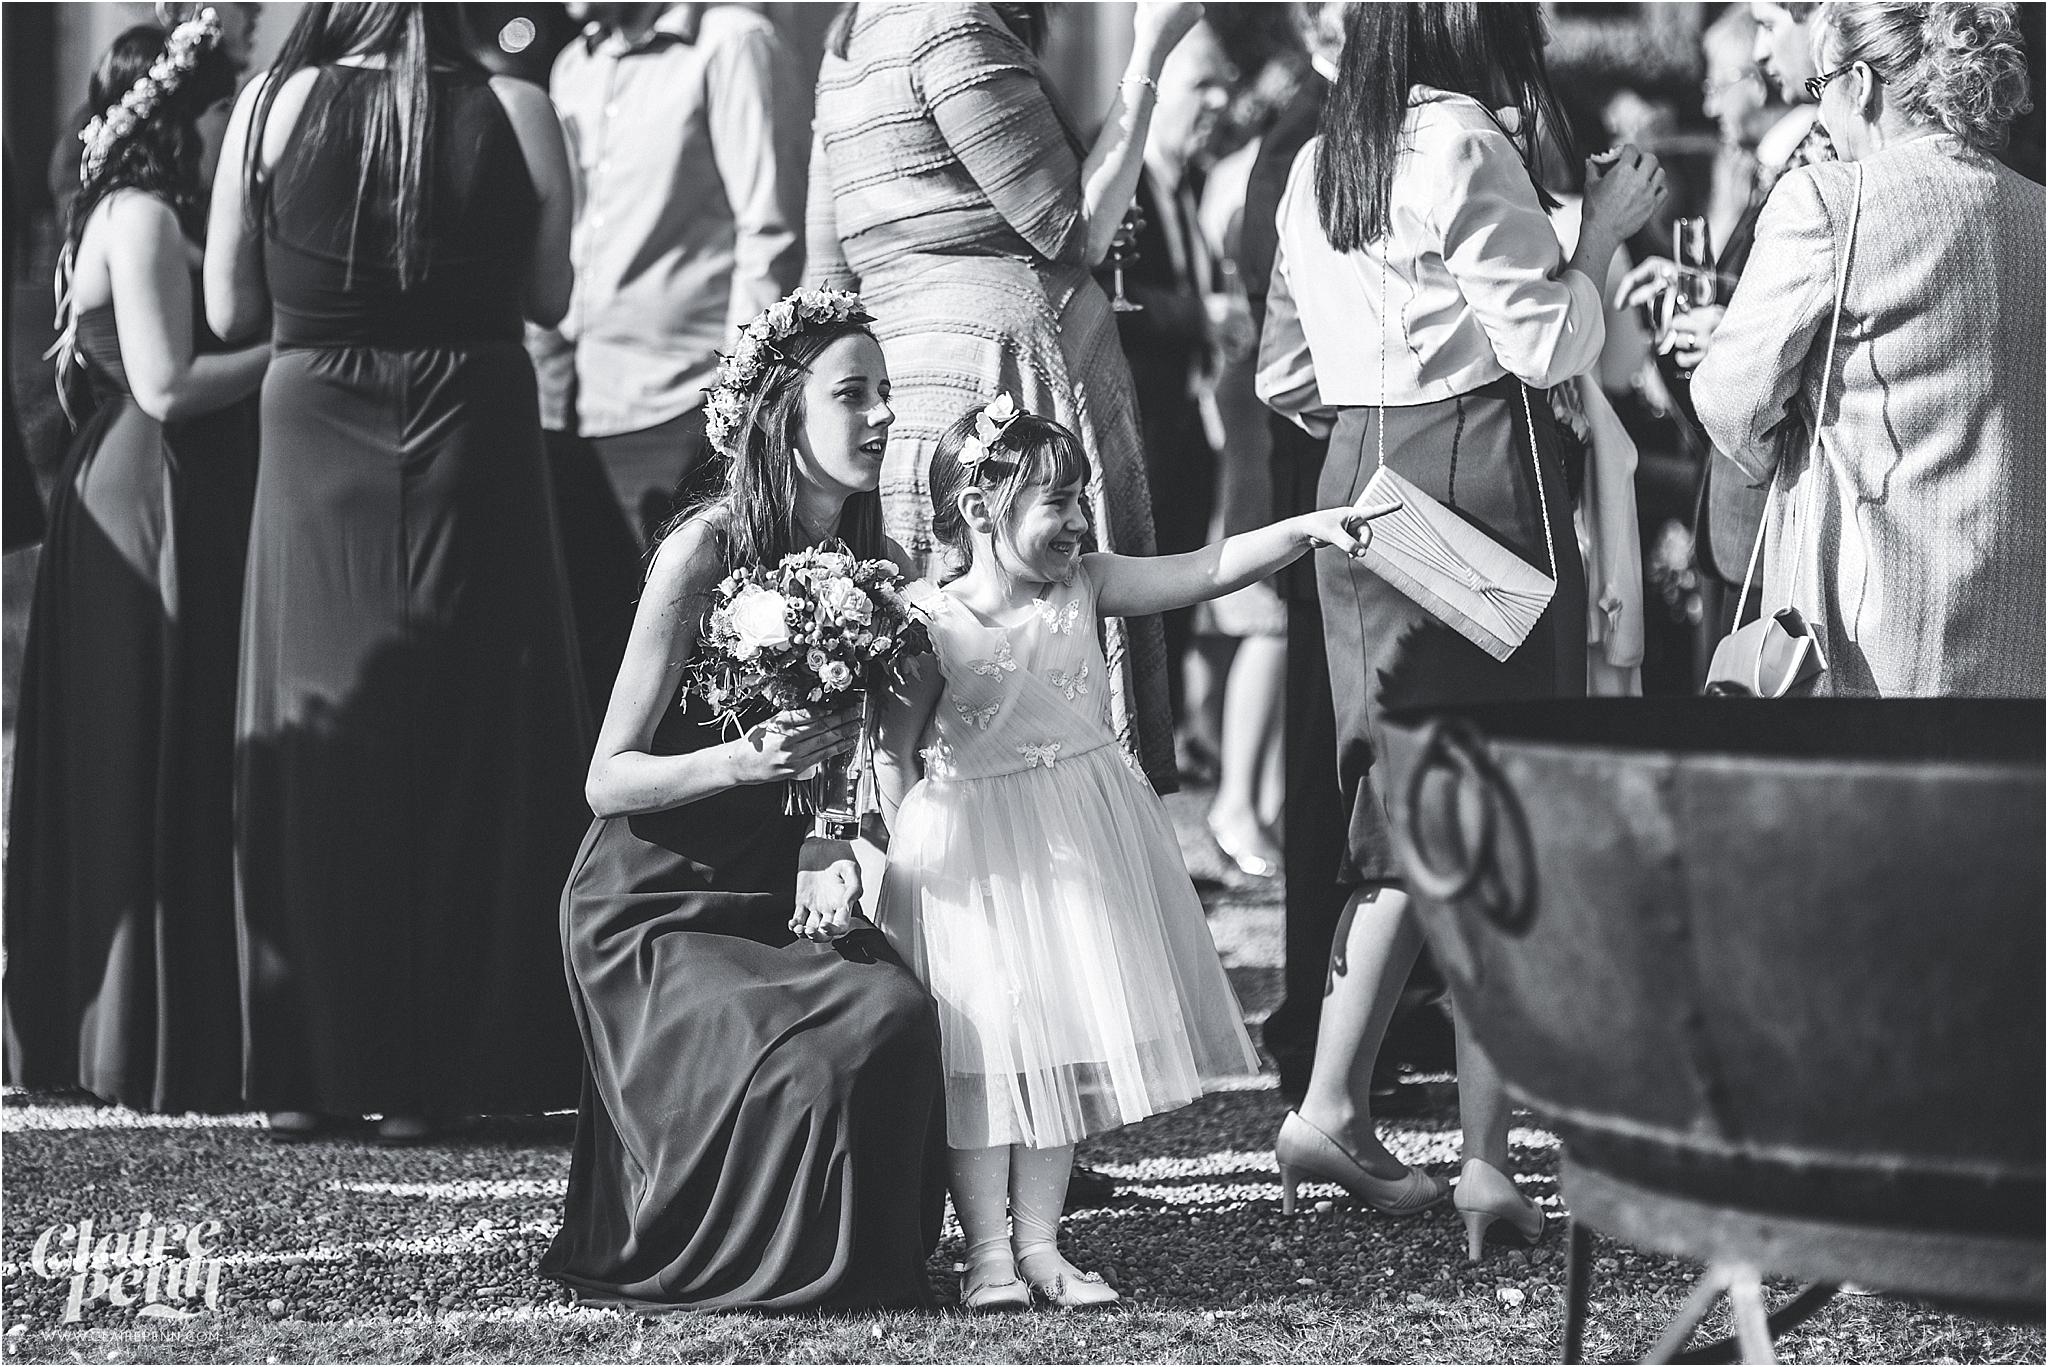 Iscoyd Park wedding, Whitchurch, Cheshire wedding photographer_0031.jpg